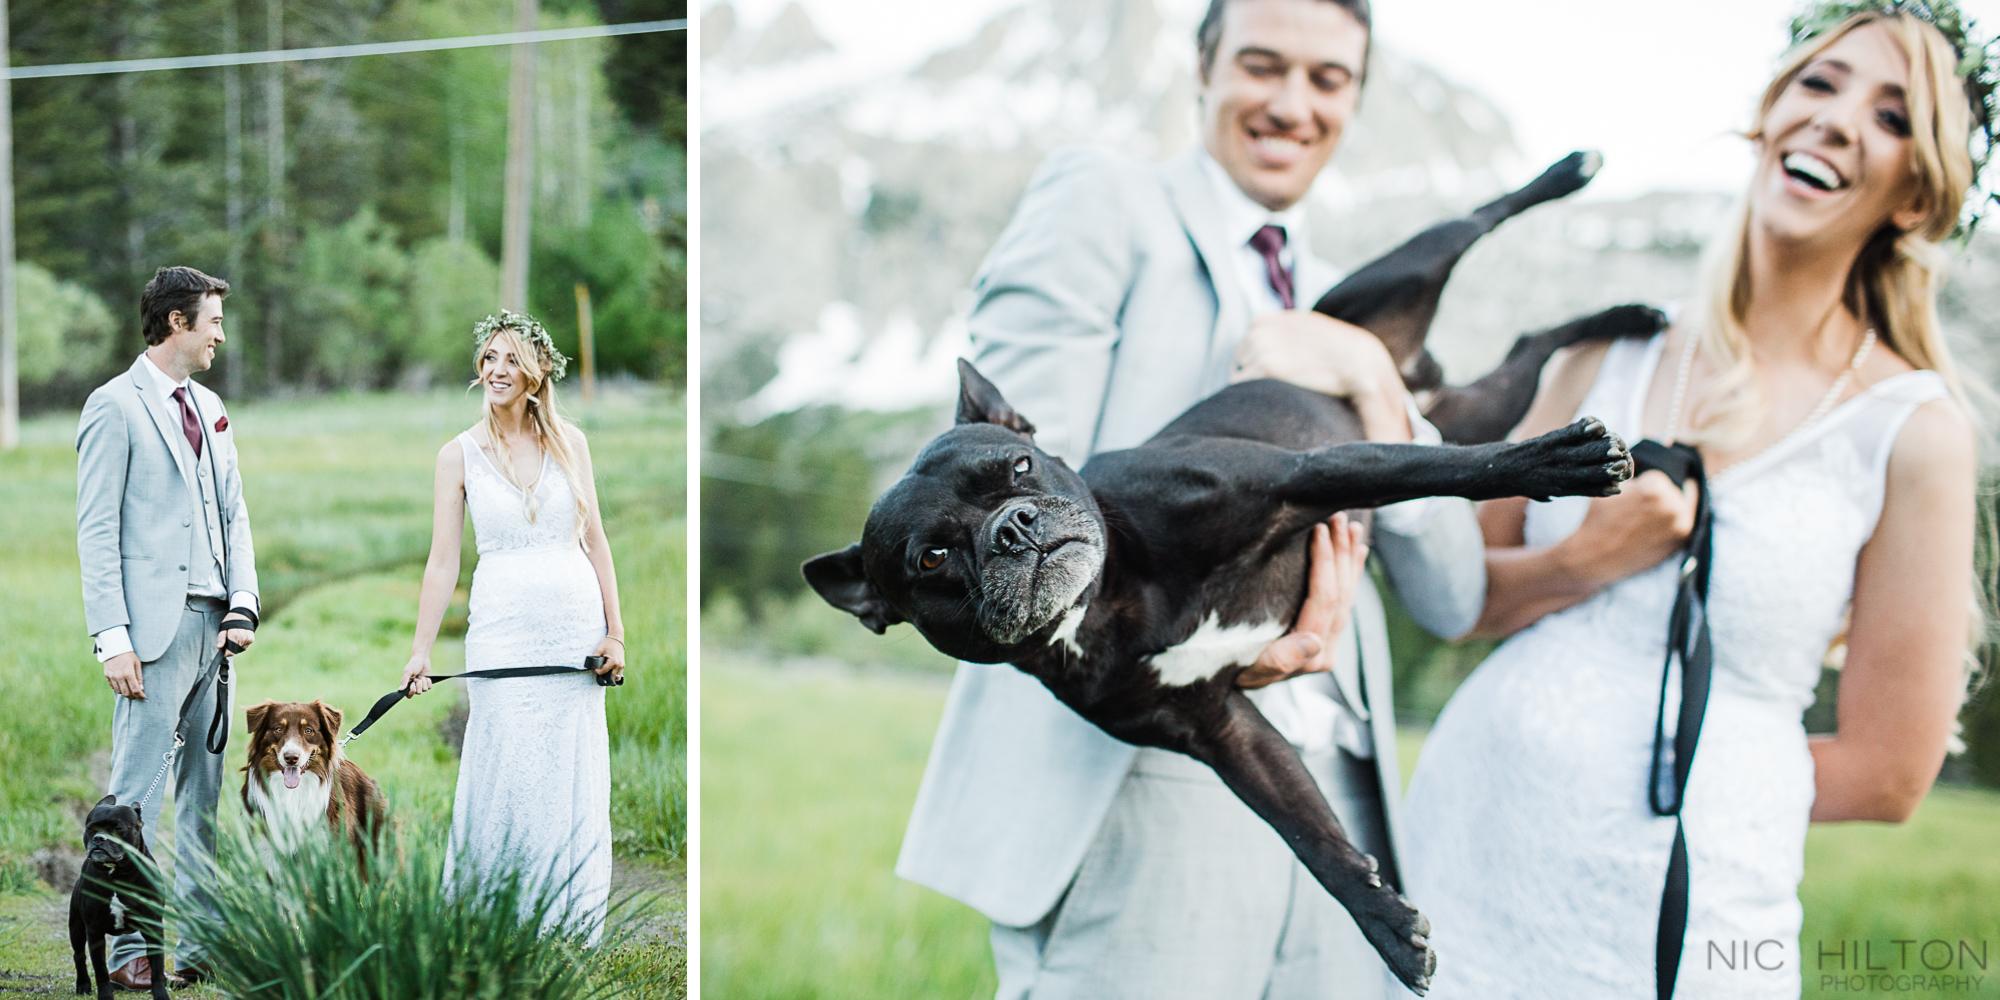 Bride-and-groom-photos-with-dog-double-eagle.jpg